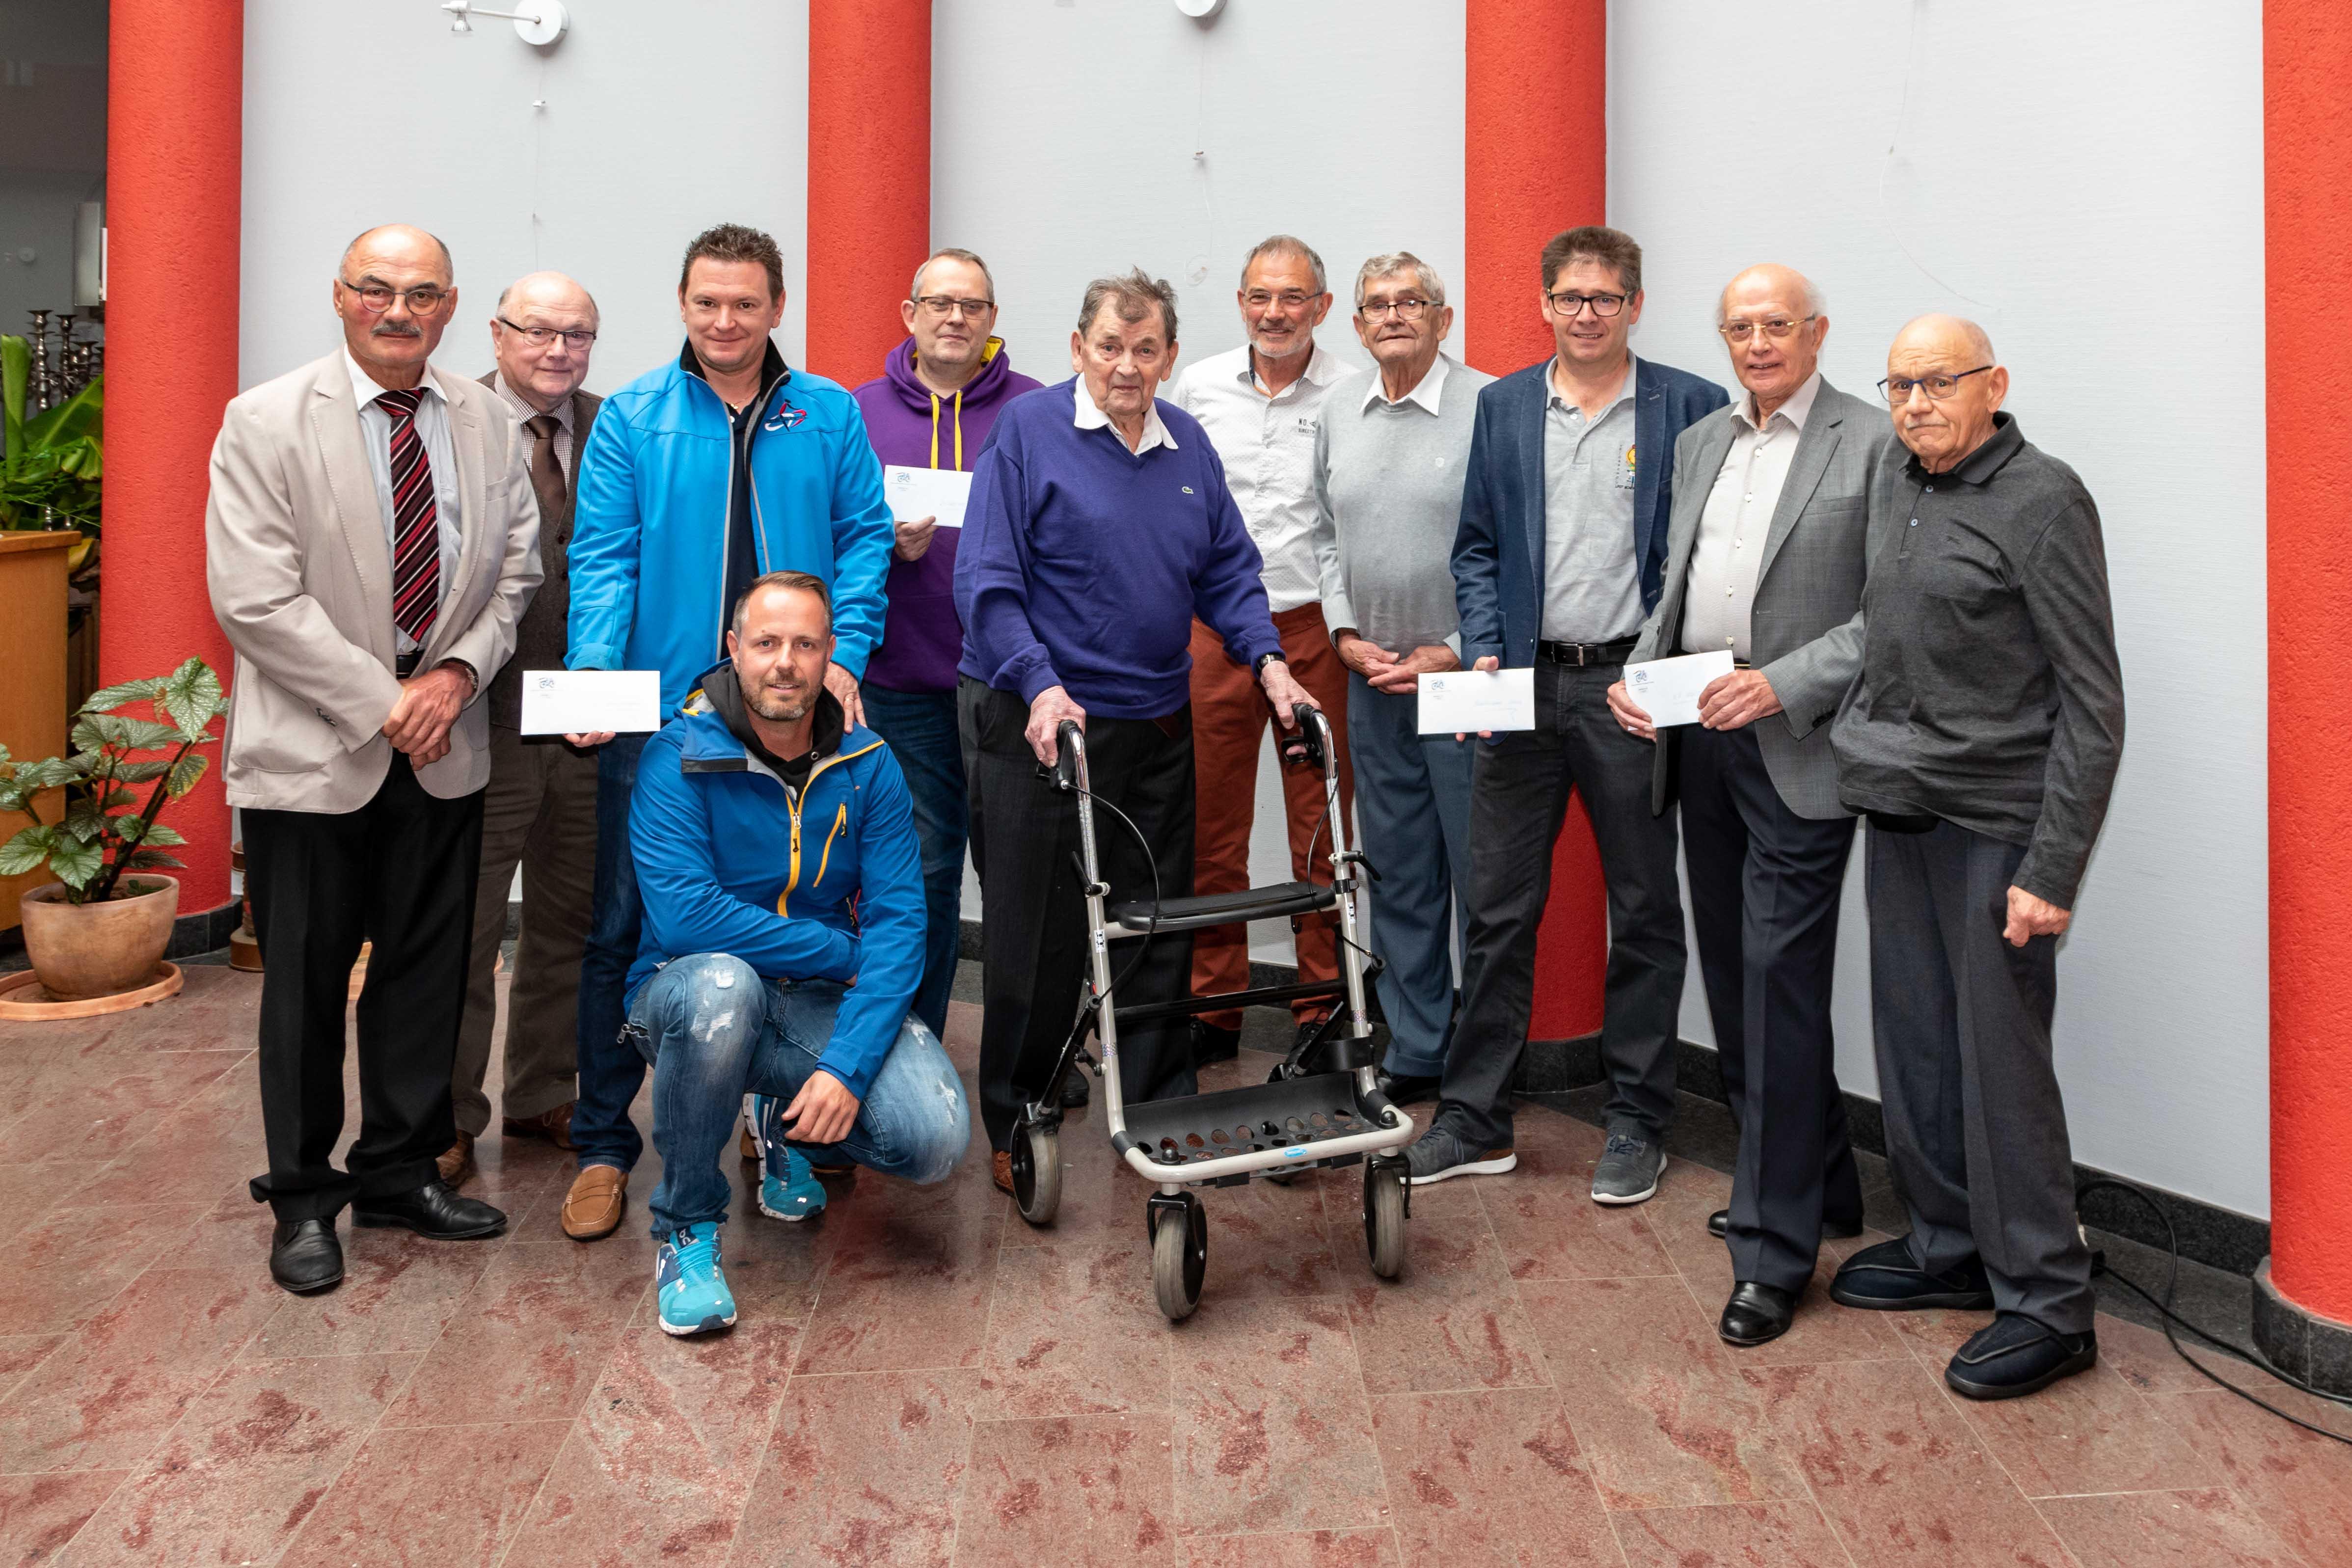 Amicale des Anciens Coureurs ënnerstëtzt d'Vëlosschoulen